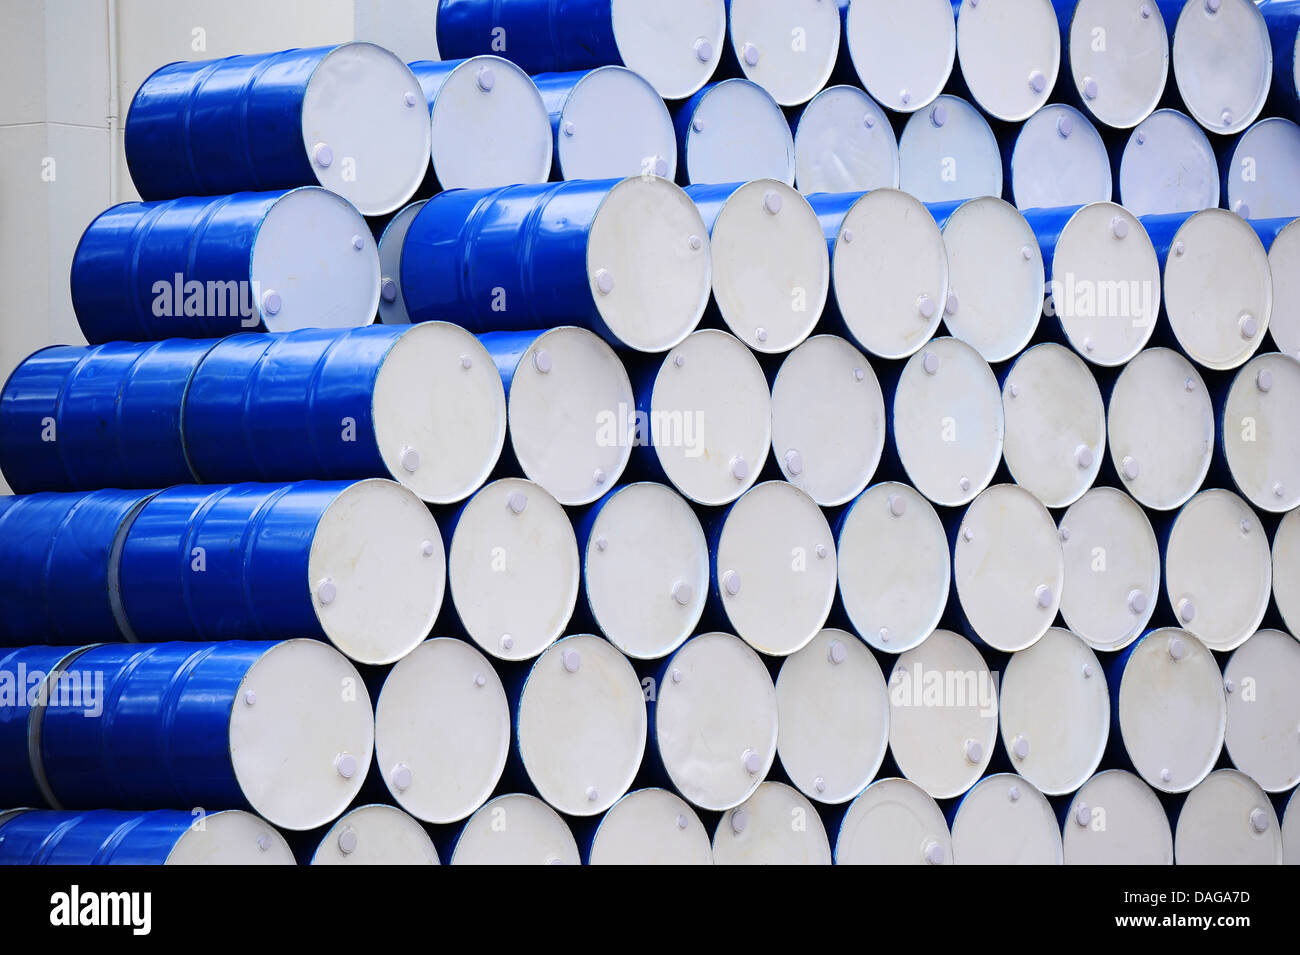 Oil Barrels - Stock Image